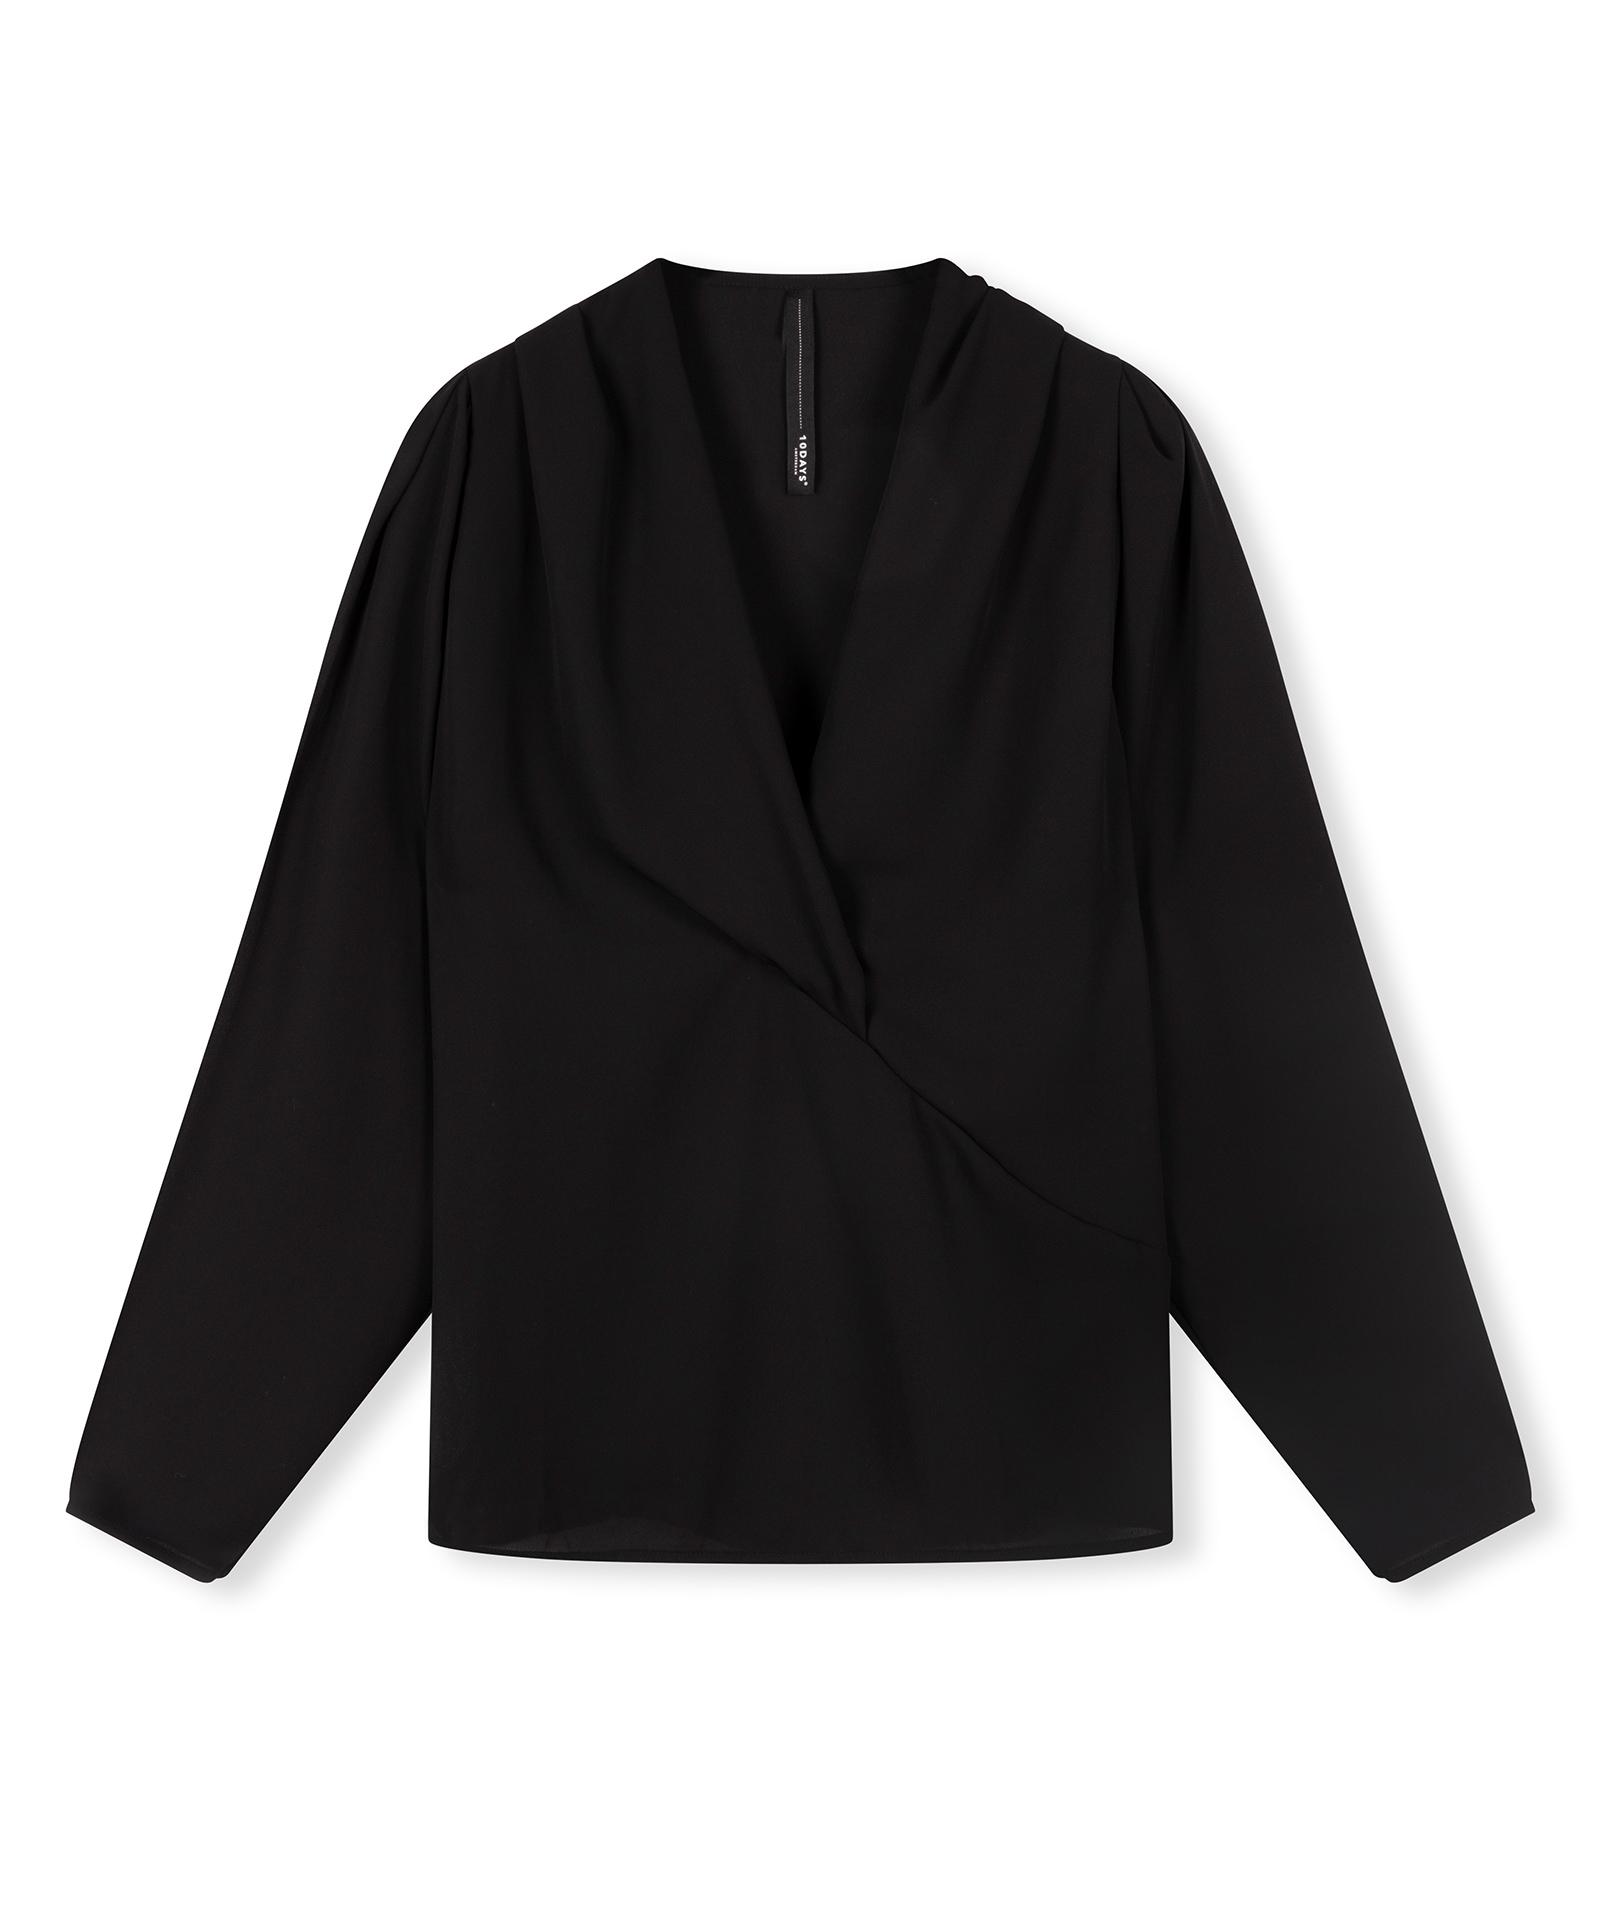 Overlap Draped Blouse - Black